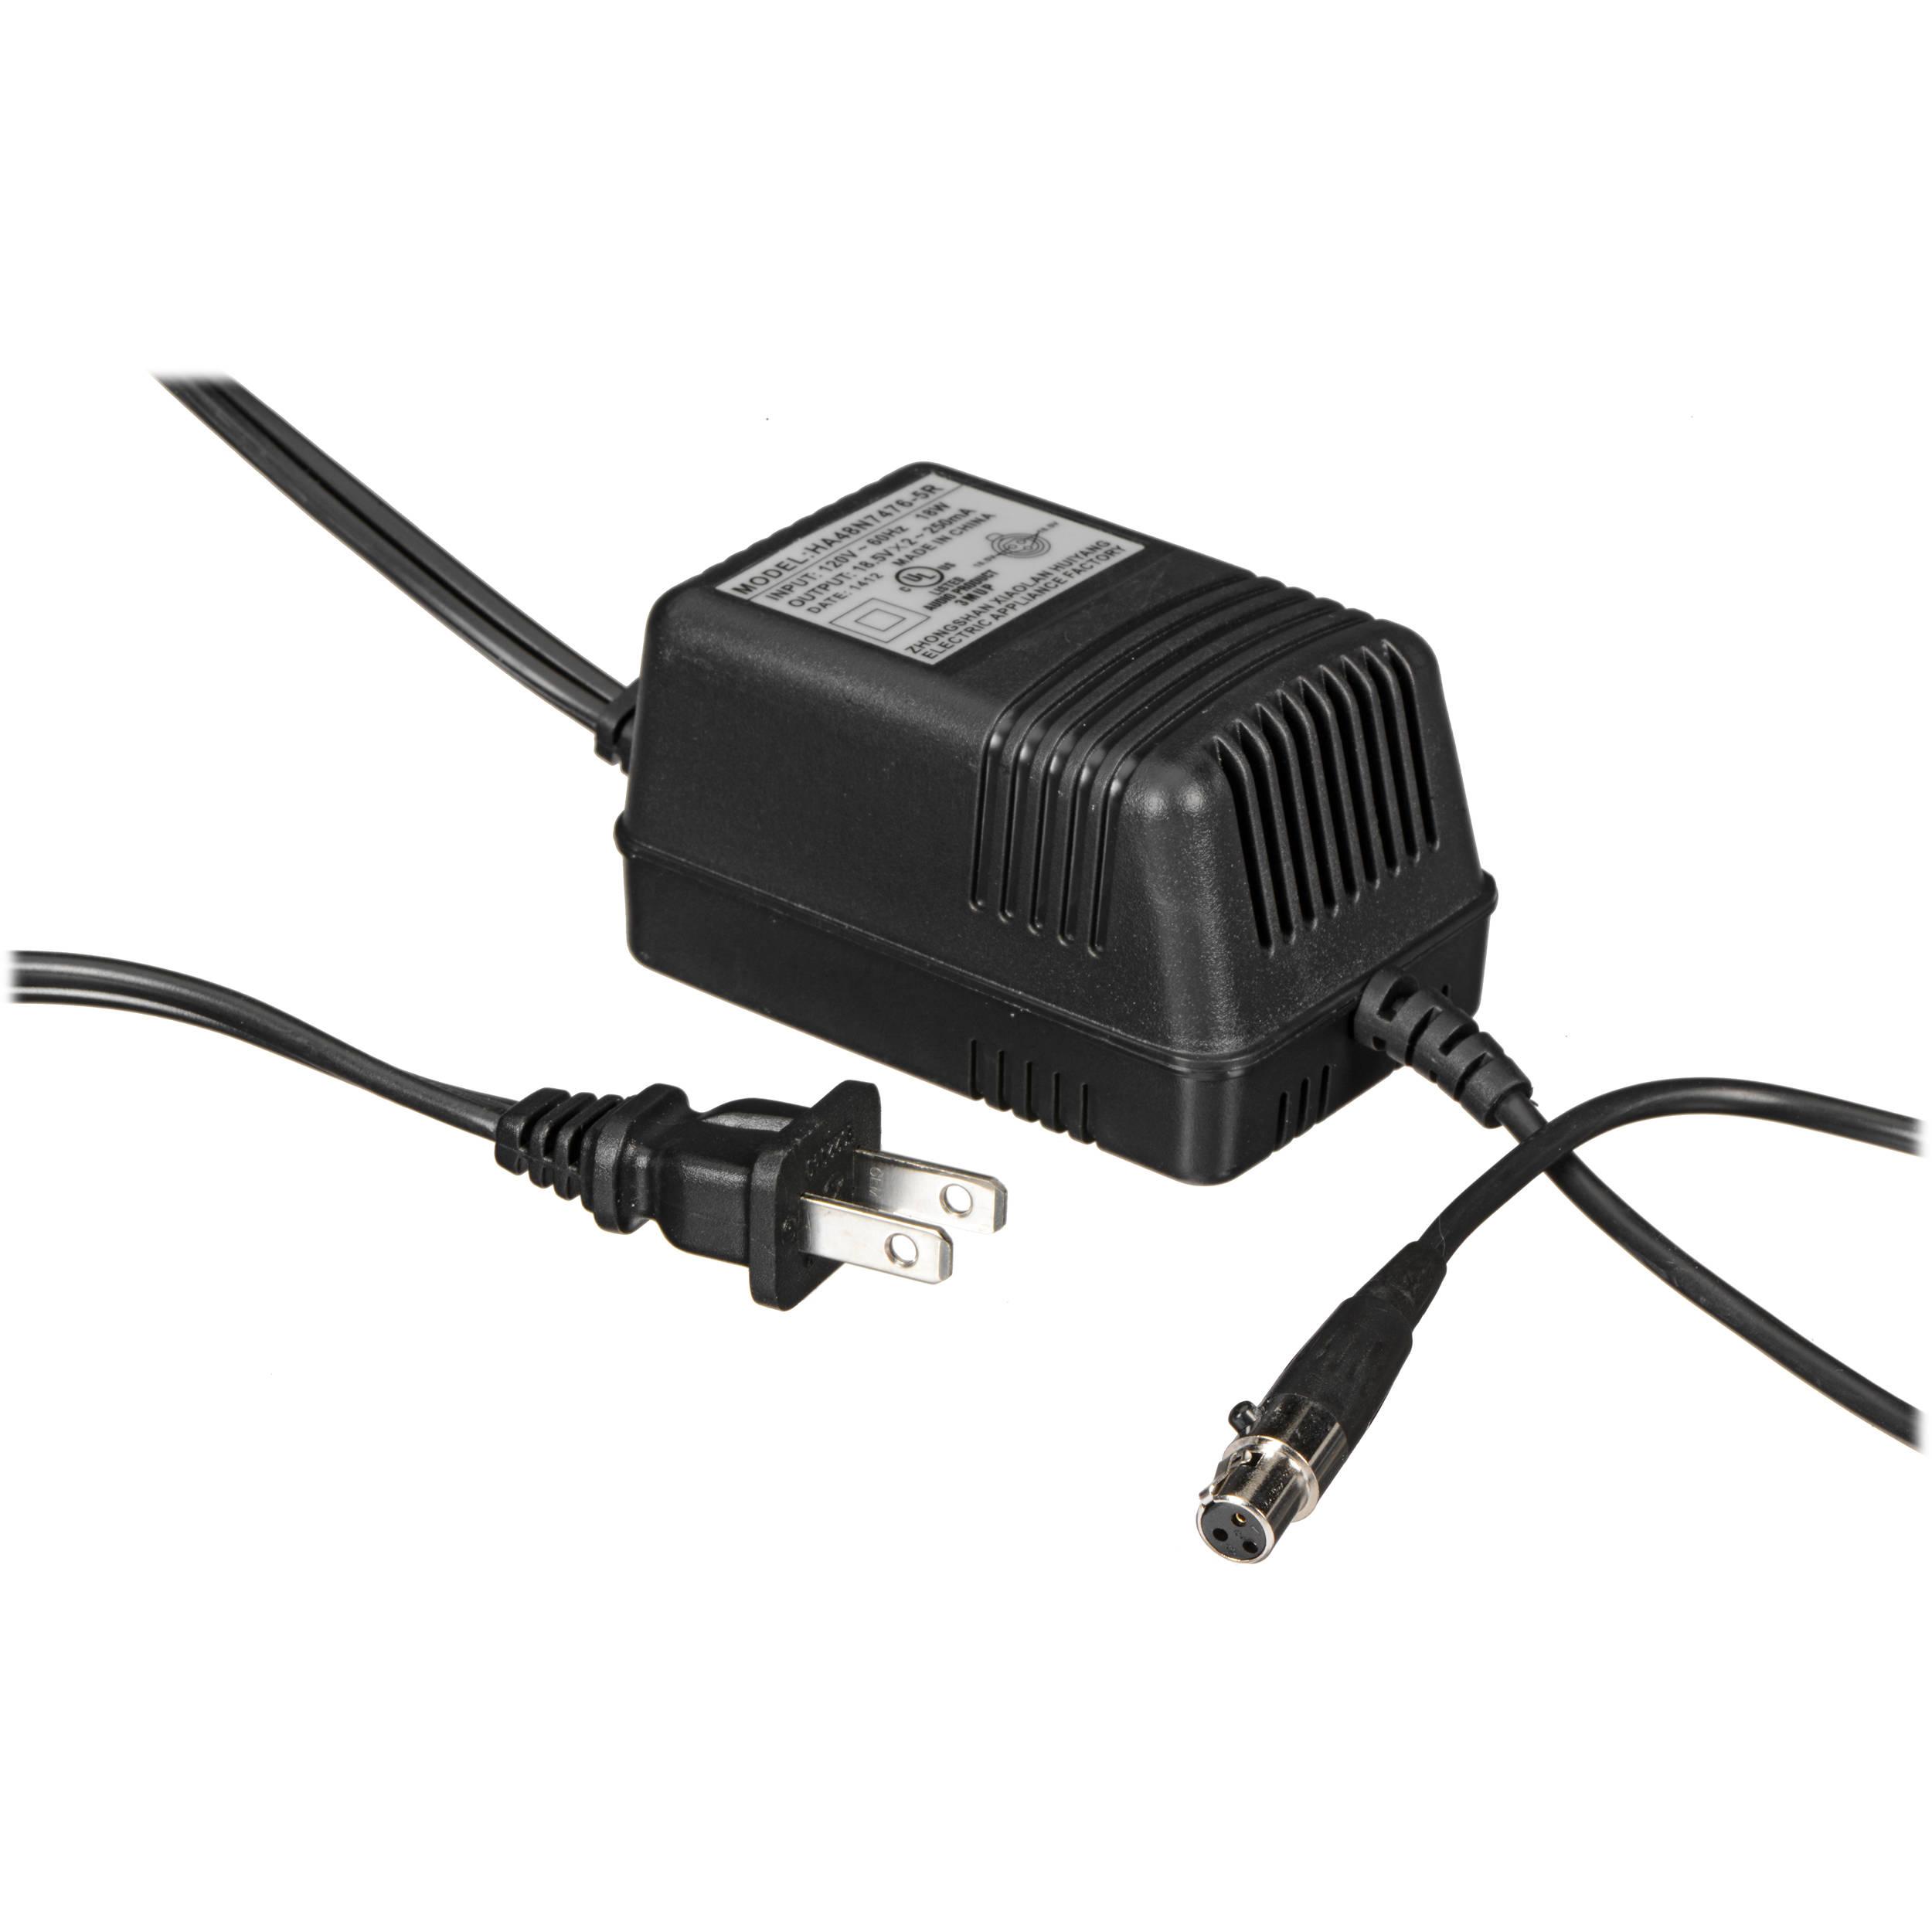 Mackie External Power Supply (2 x 18 5 VAC / 250 mA, US)